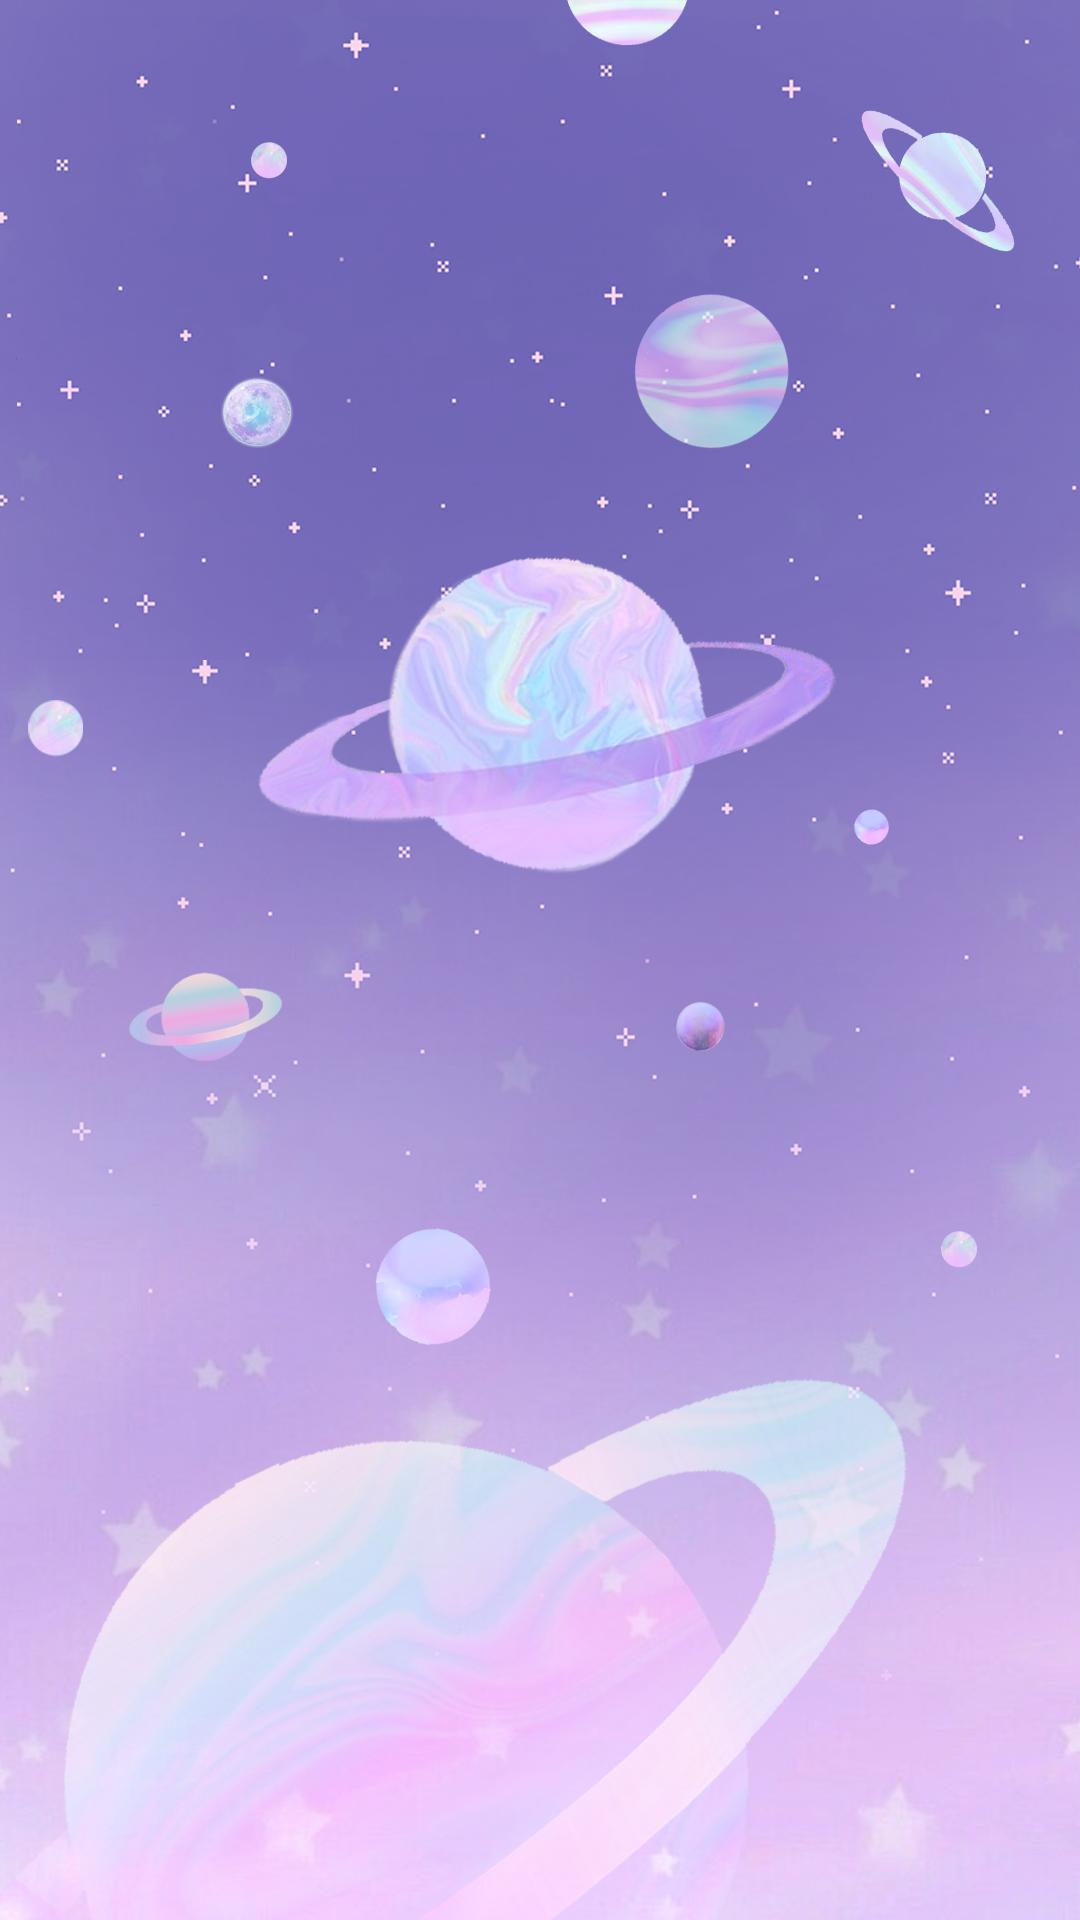 Wallpaper Galáxia Holográfica By Gocase Space Galáxia